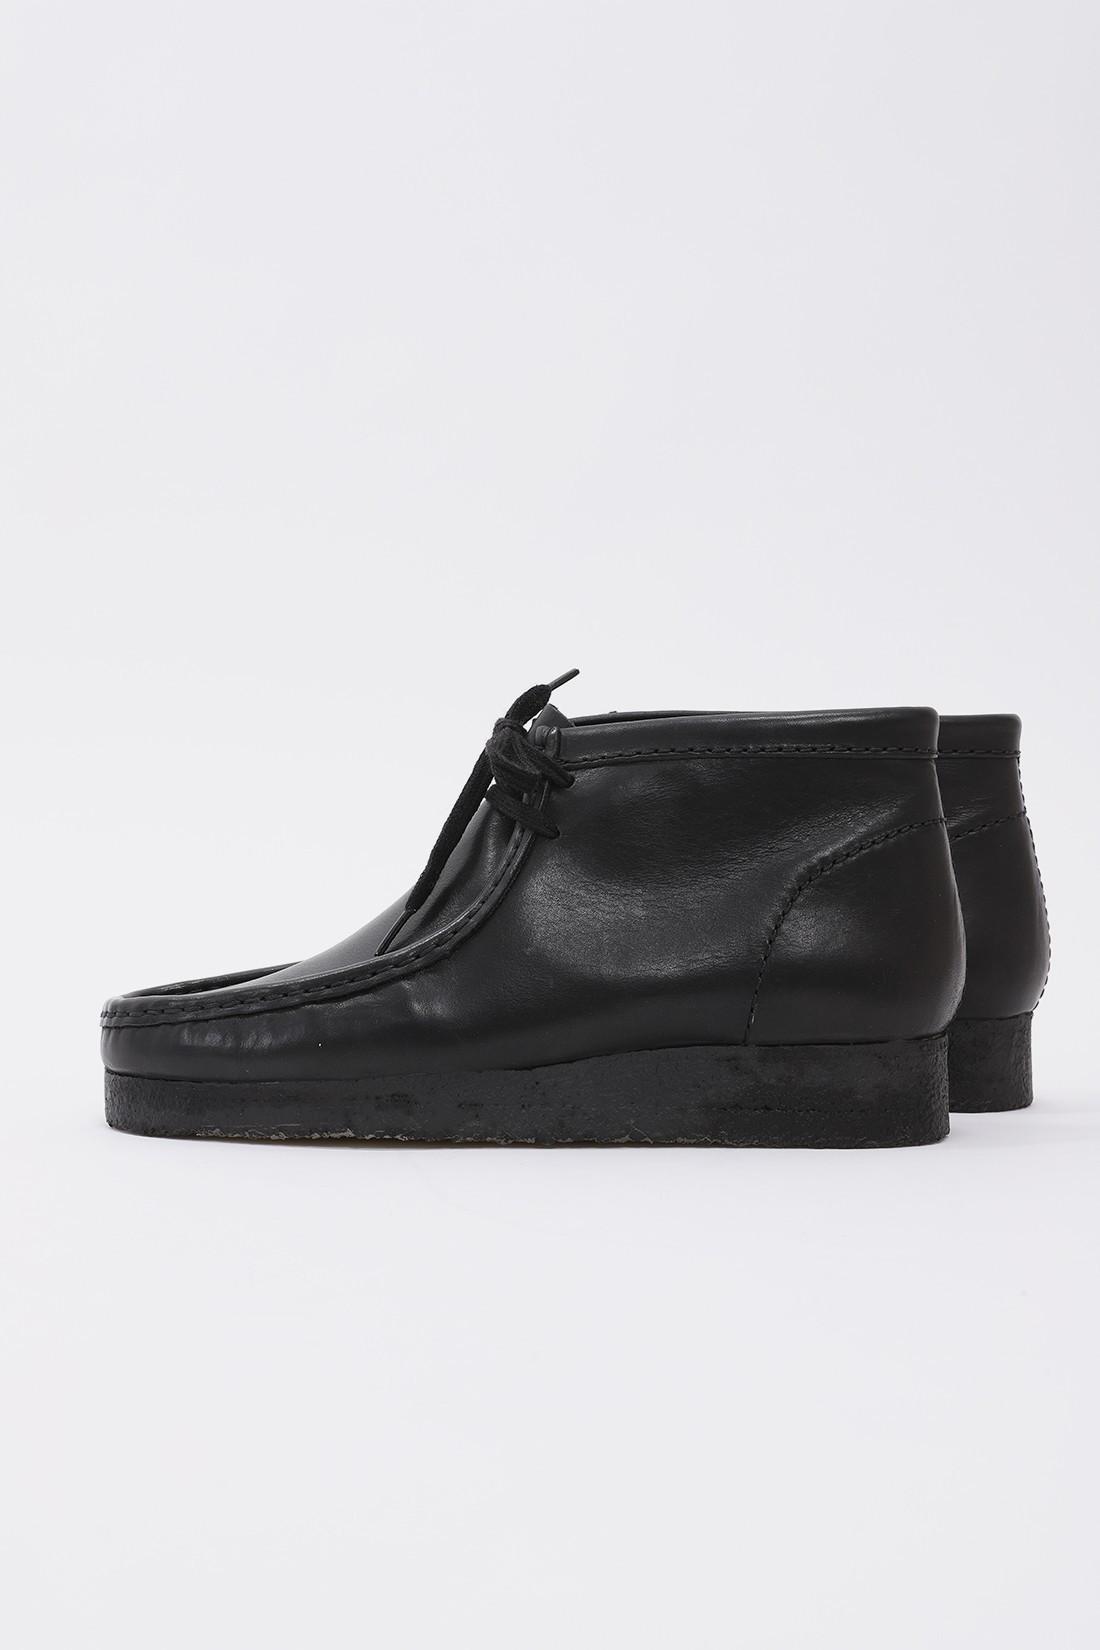 CLARKS ORIGINALS / Wallabee boot Black leather